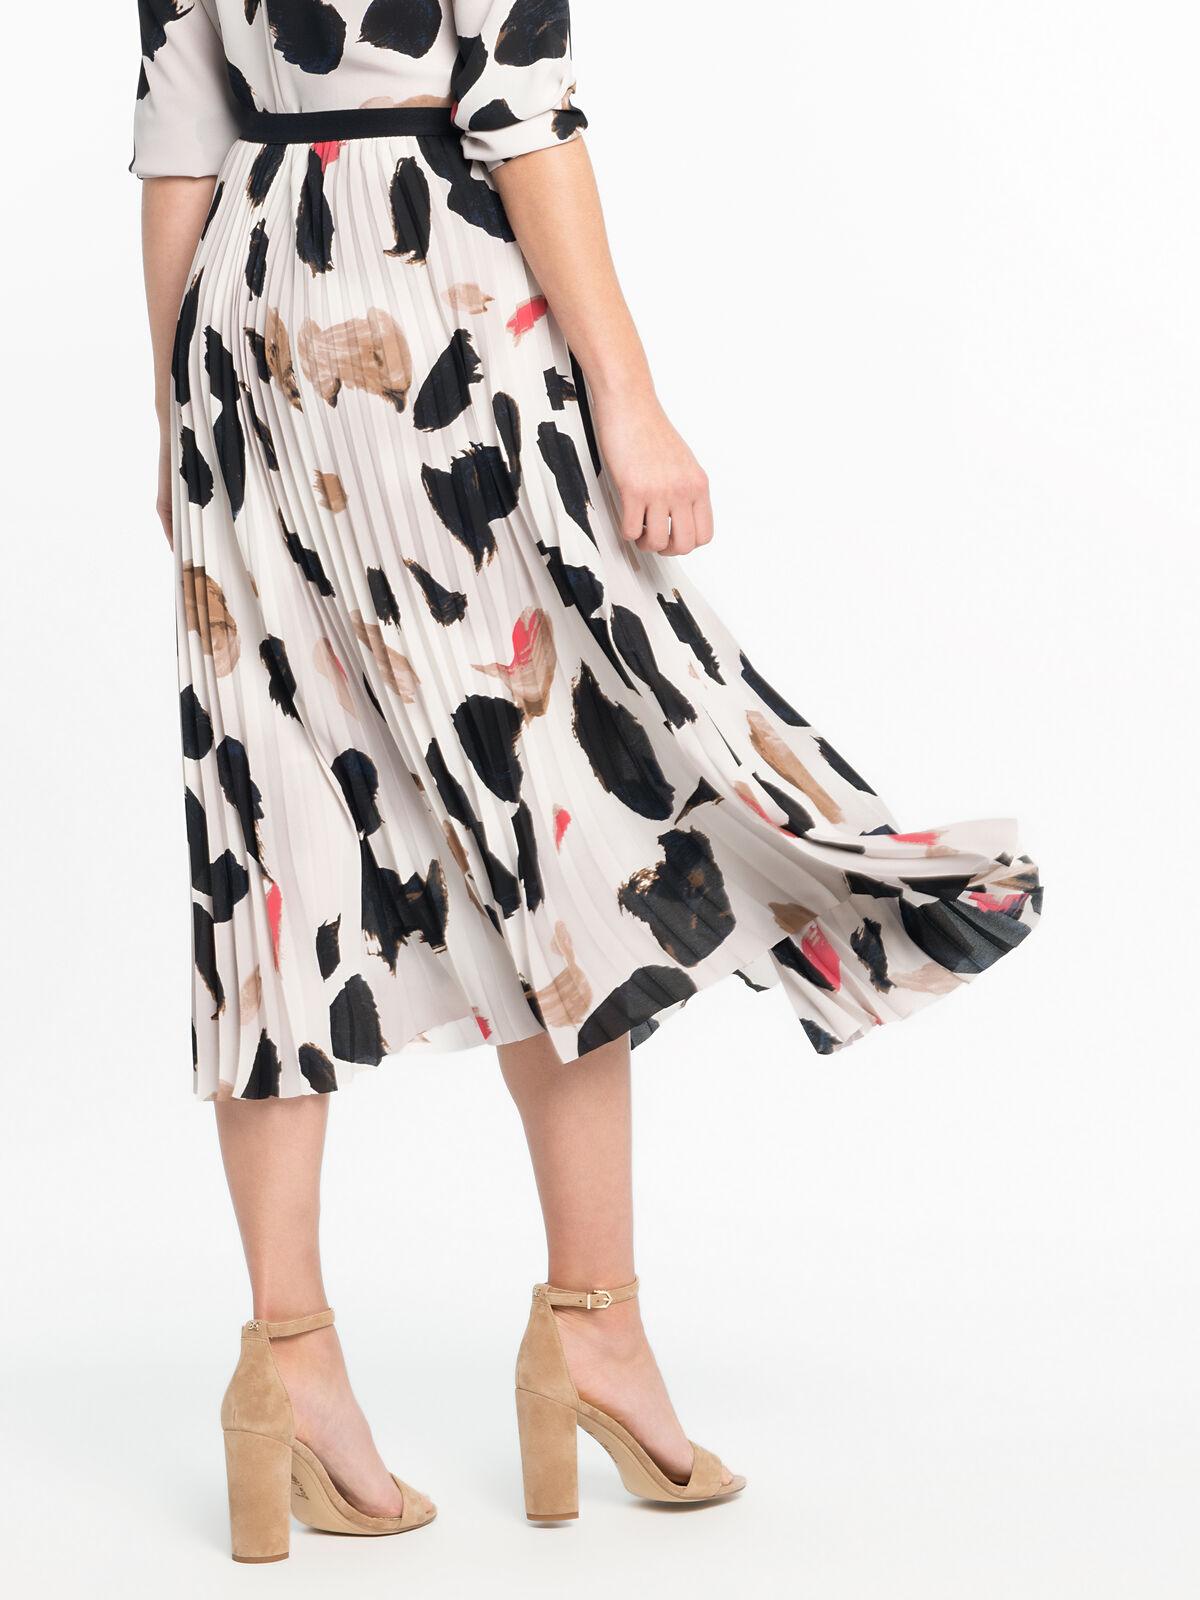 Reflections Skirt